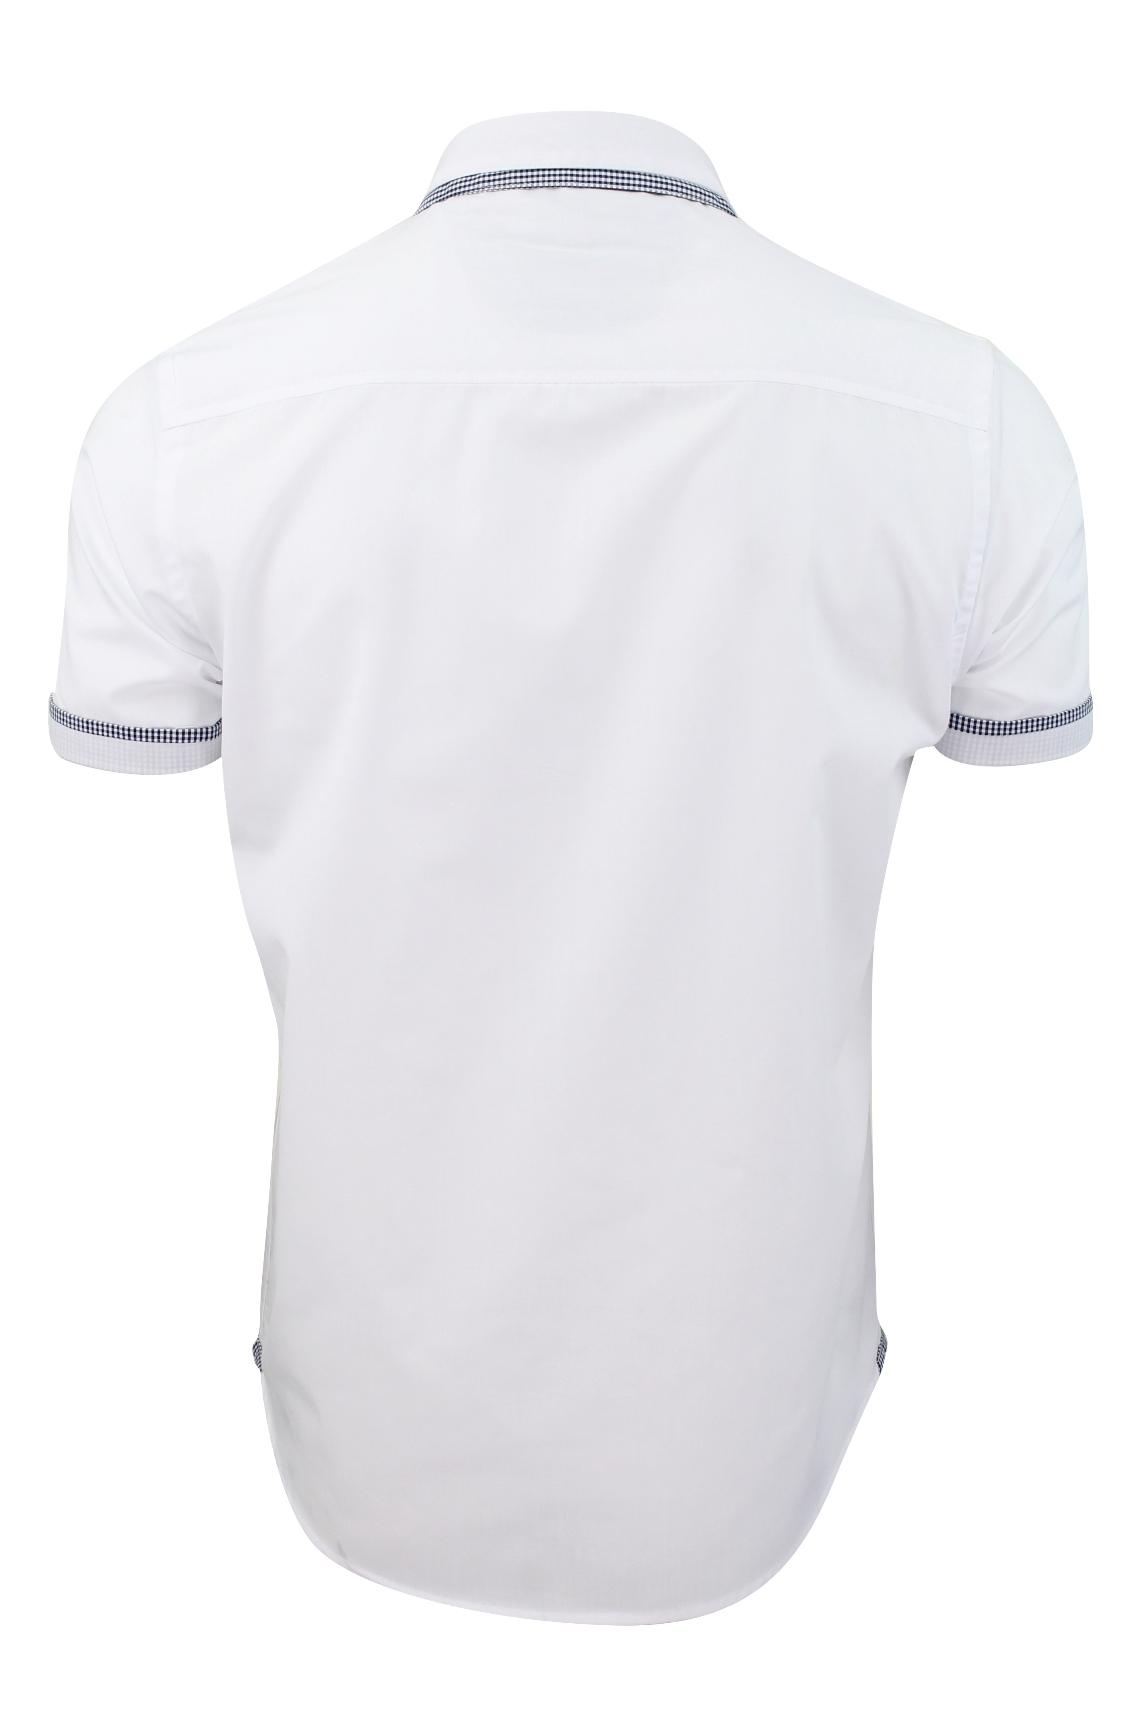 Mens-Shirt-by-Brave-Soul-039-Colvin-039-Gingham-Trim-Short-Sleeved thumbnail 10